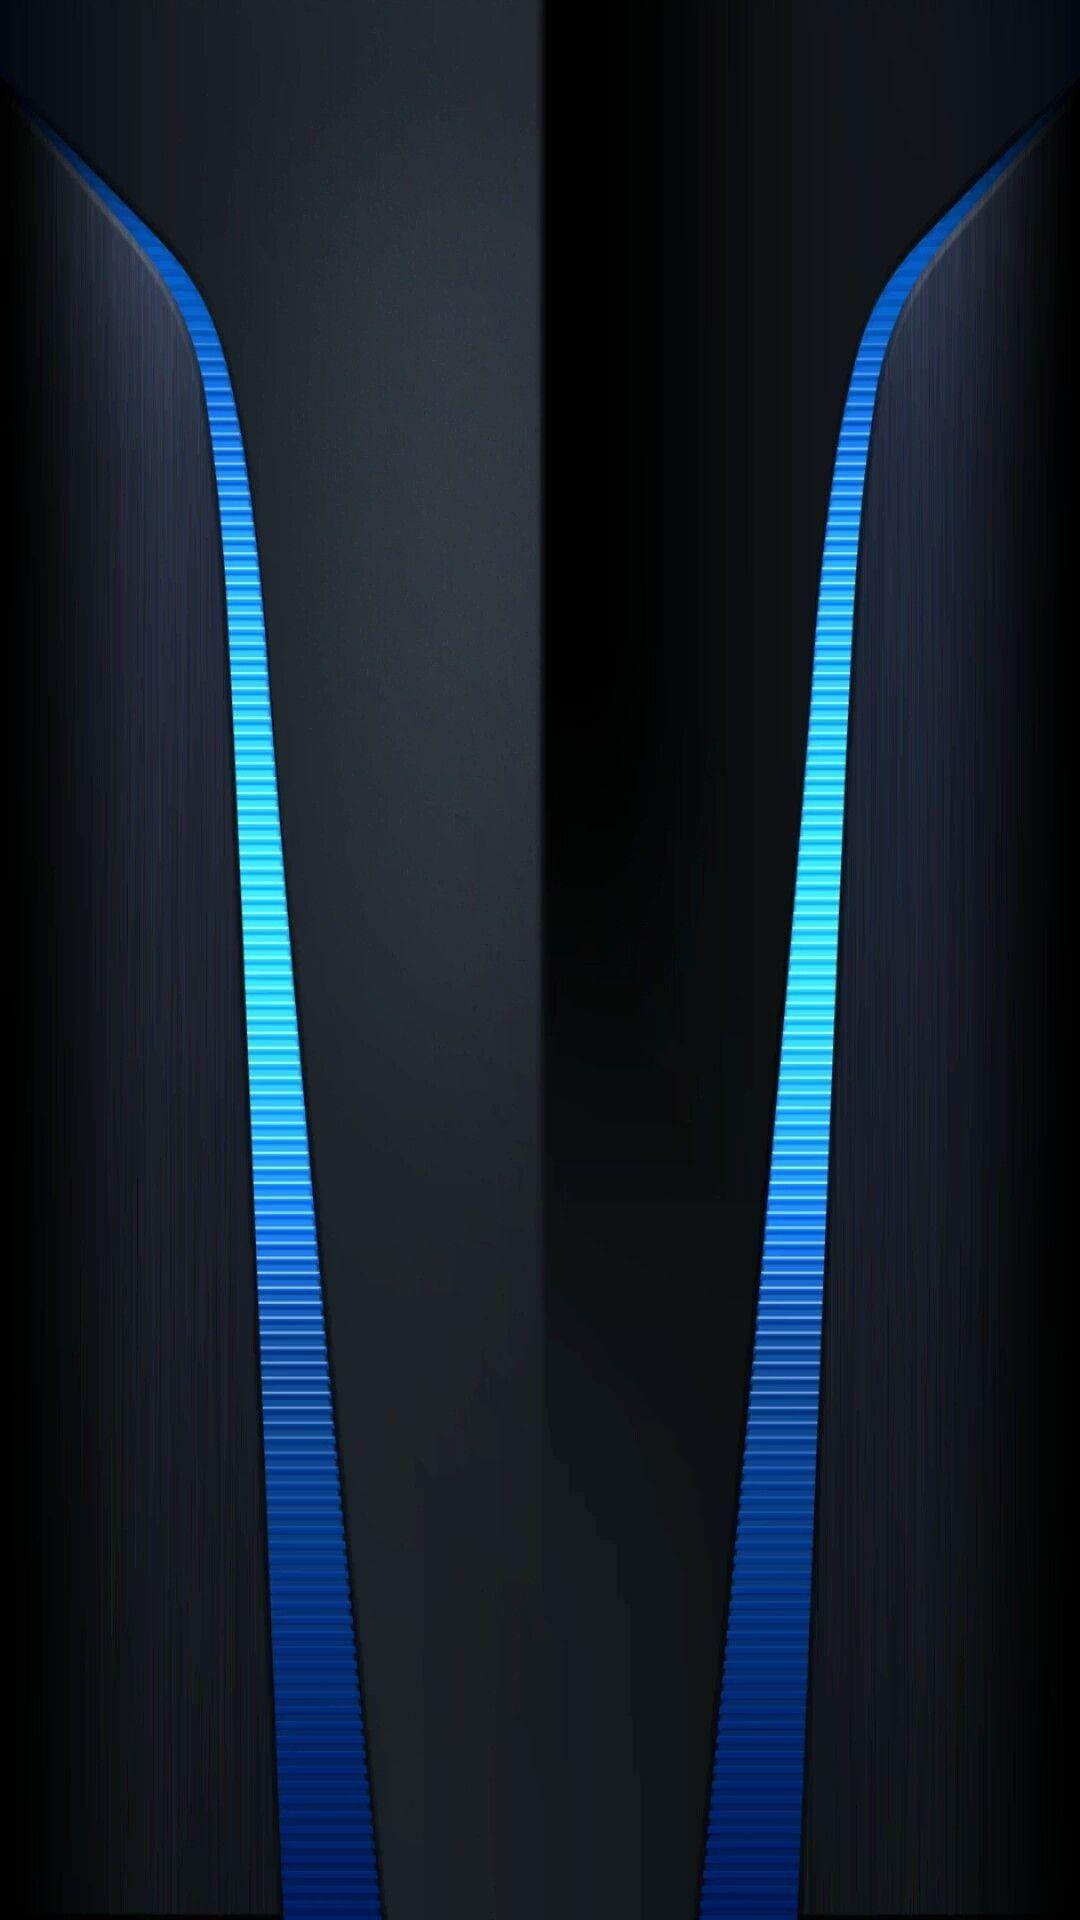 Navy With Neon Blue Abstract Wallpaper Seni Digital Wallpaper